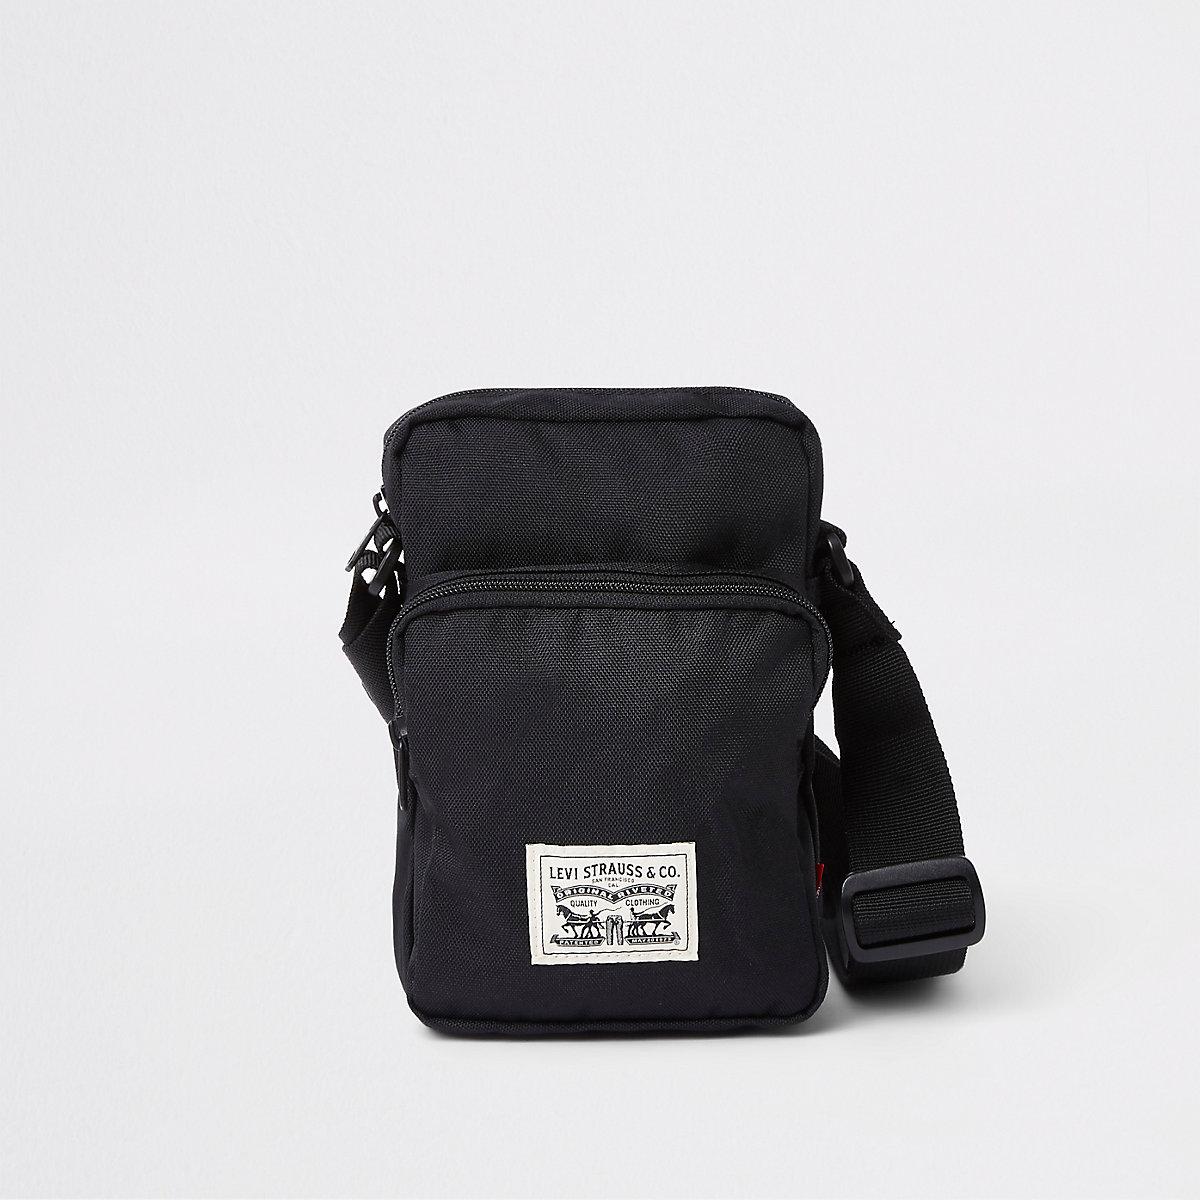 02f2e6b630c Levi s black mini cross bodyflight pouch - Cross Body Bags - Bags - men